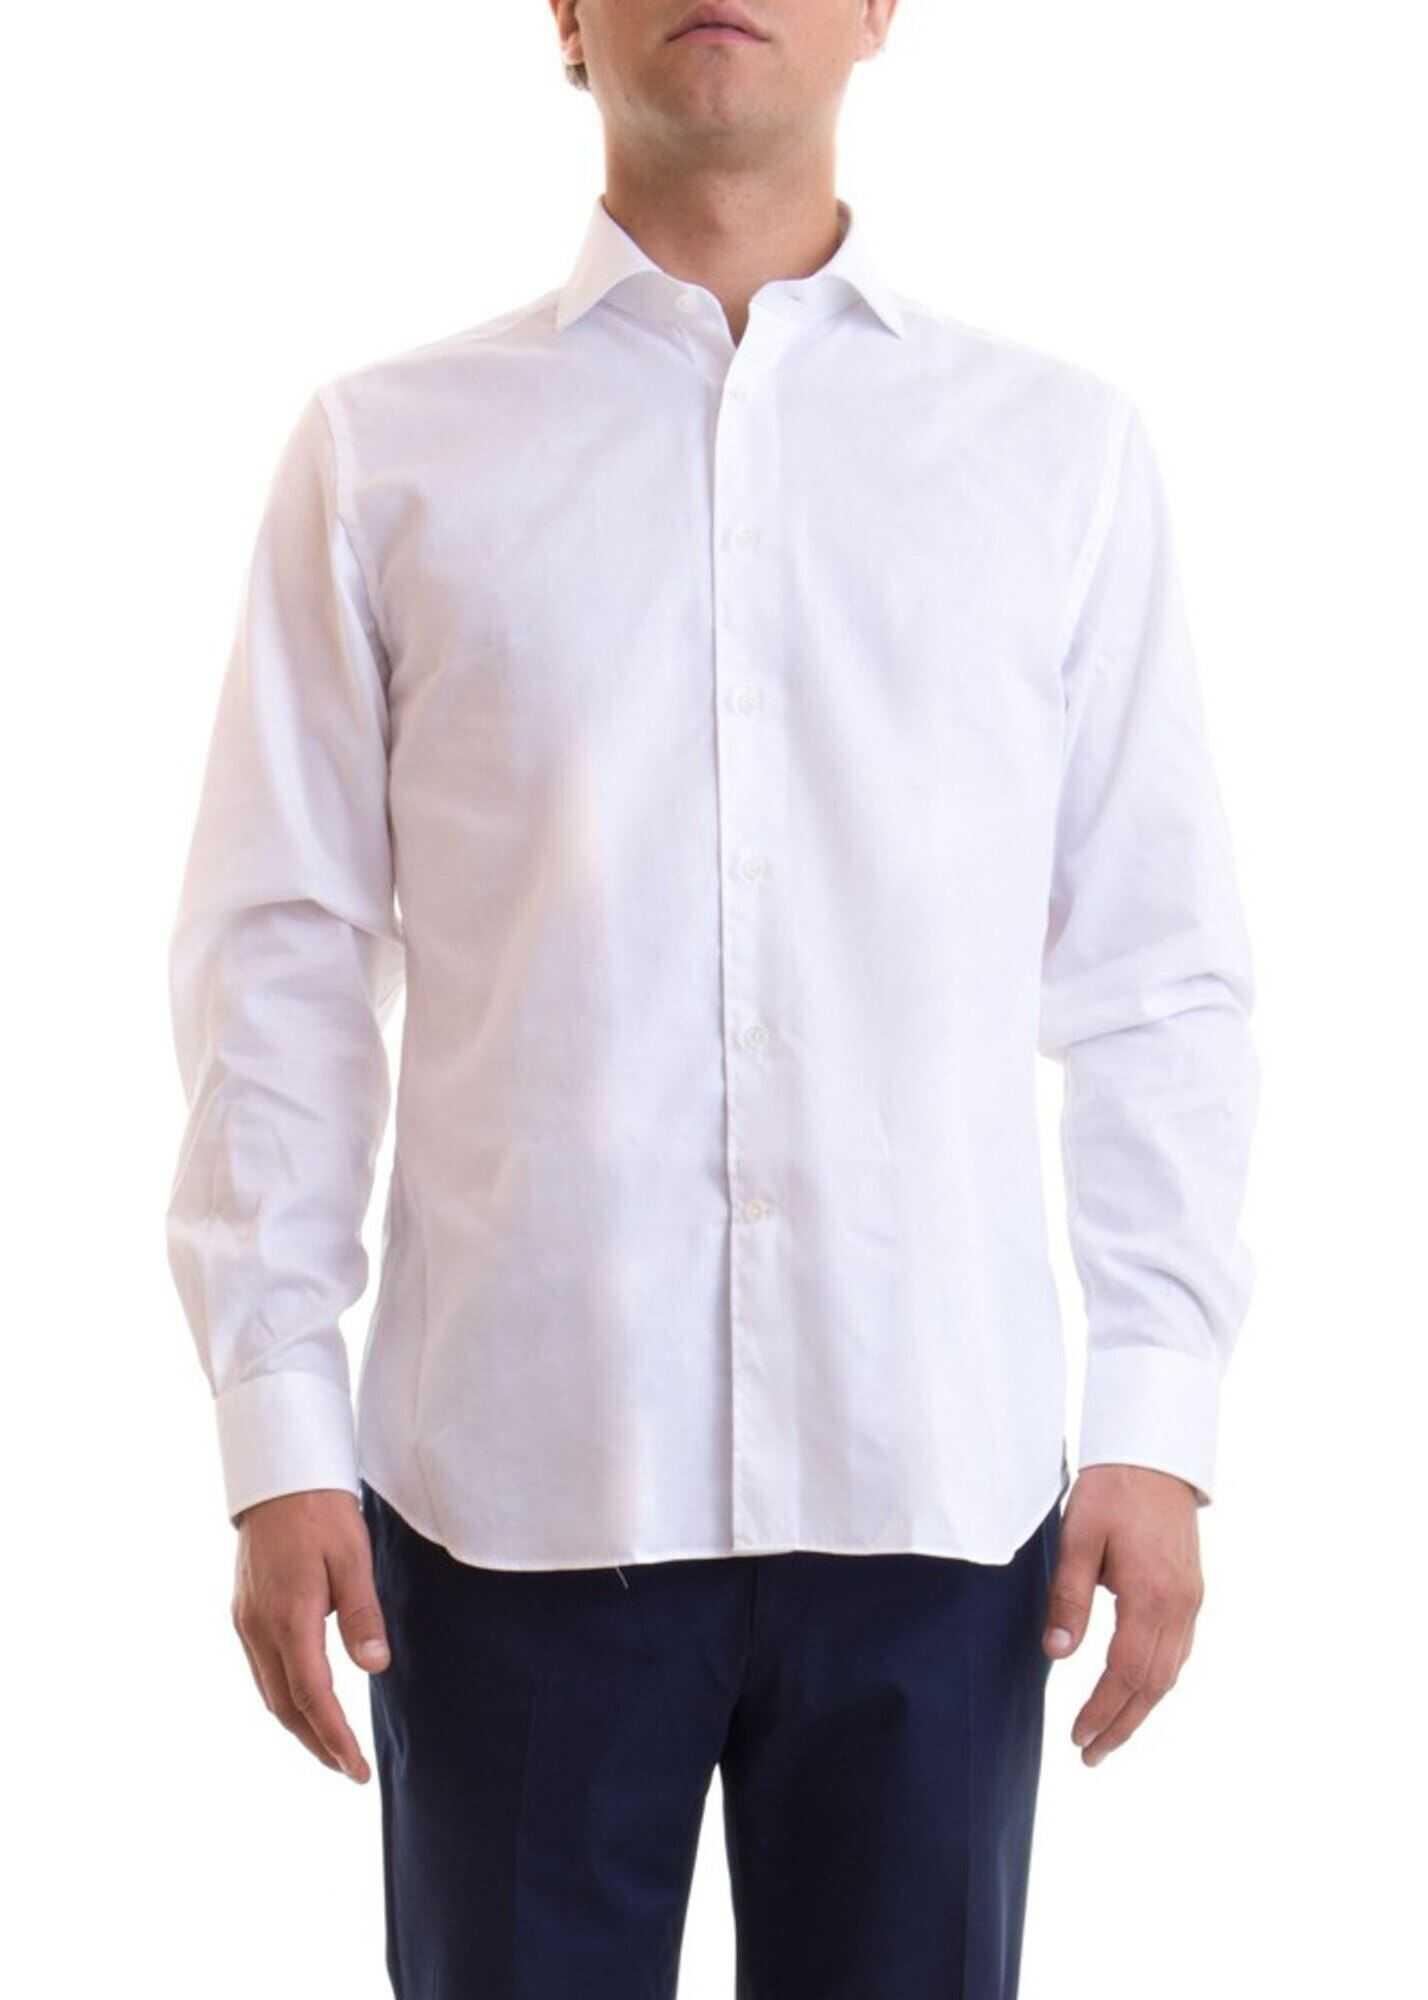 CORNELIANI Classic Cotton Shirt In White White imagine